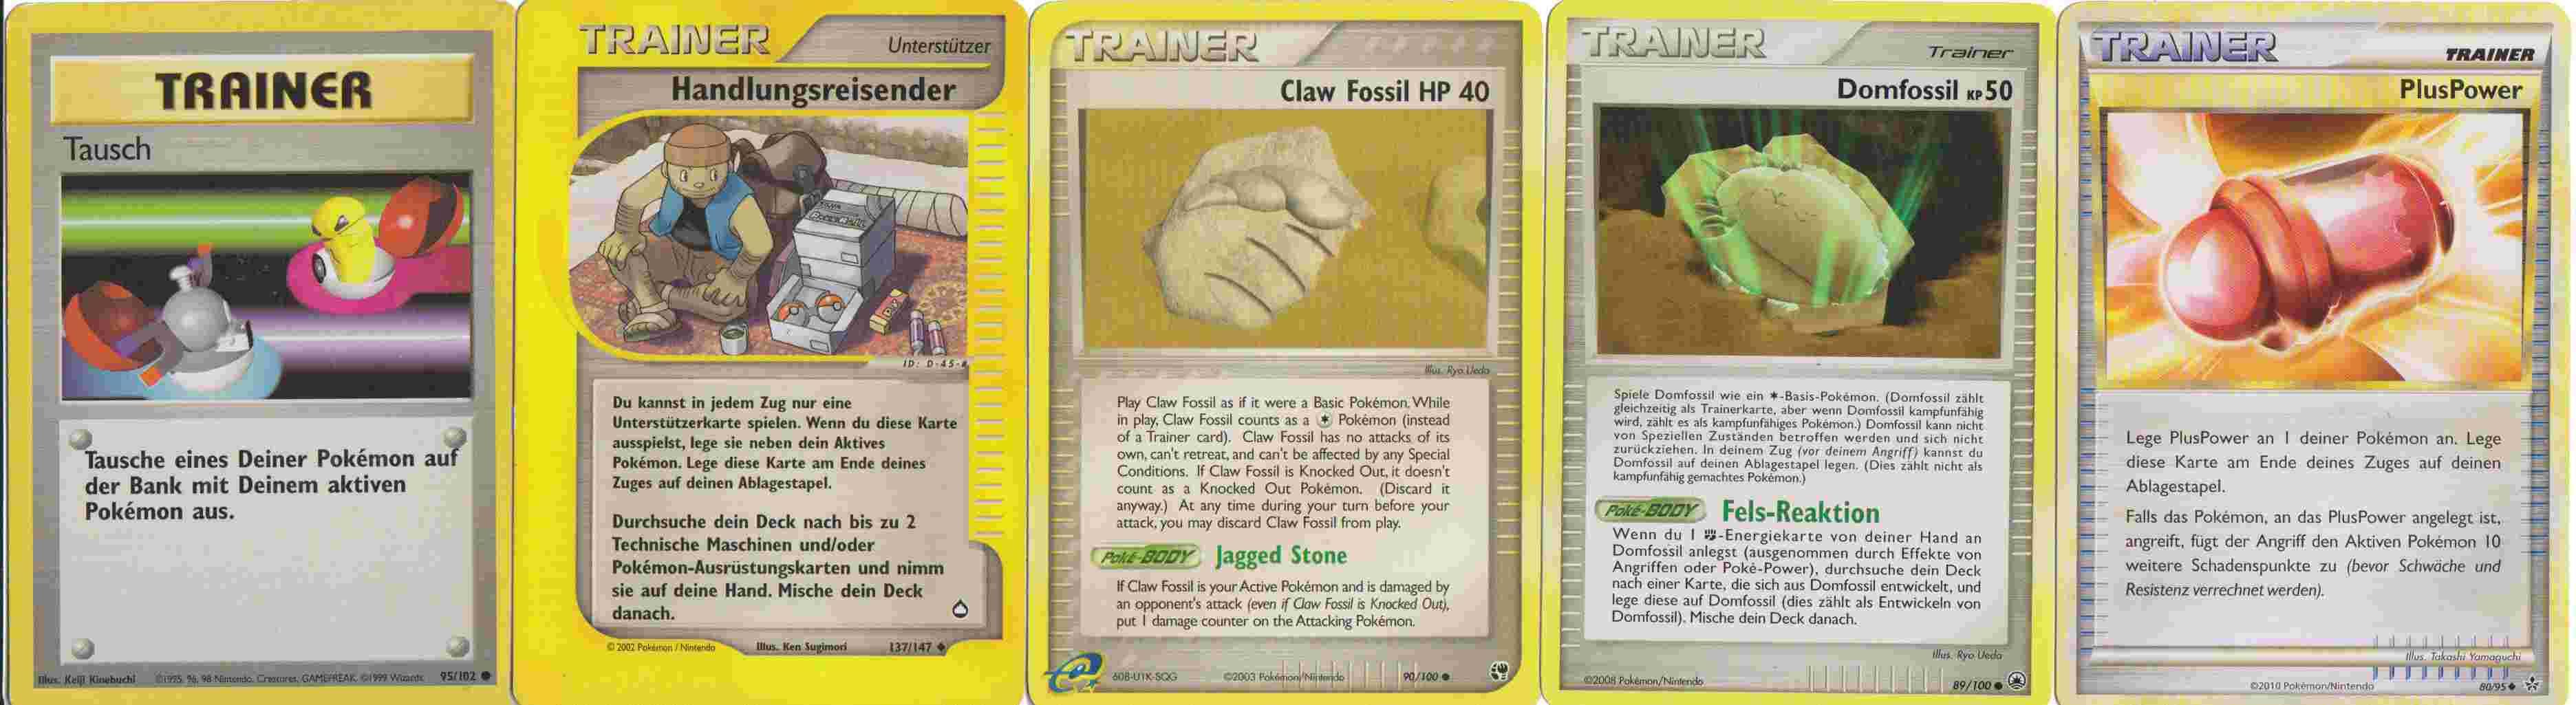 Die verschiedenen Trainer Karten